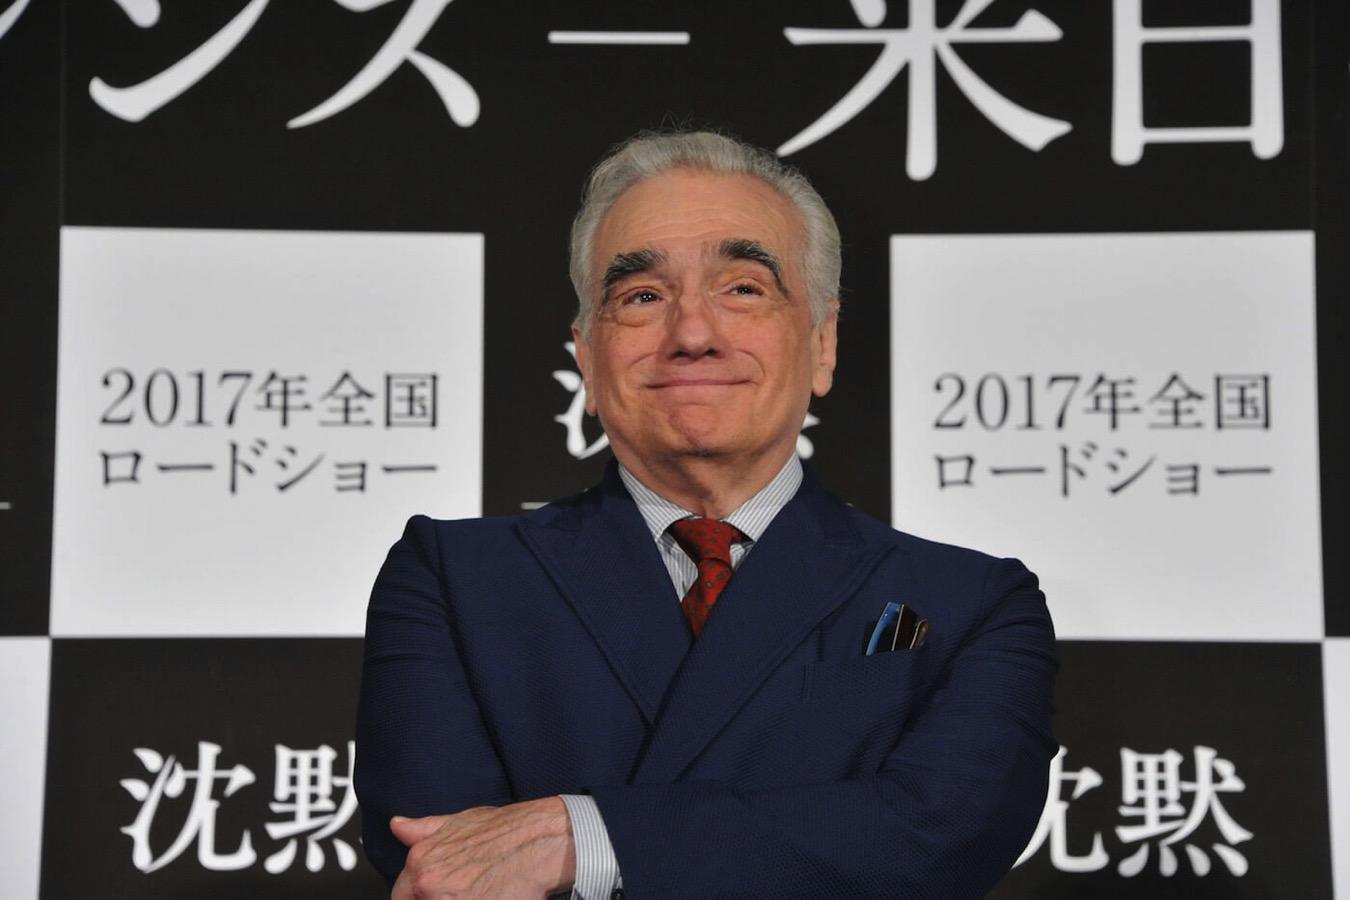 Martin Scorsese 2